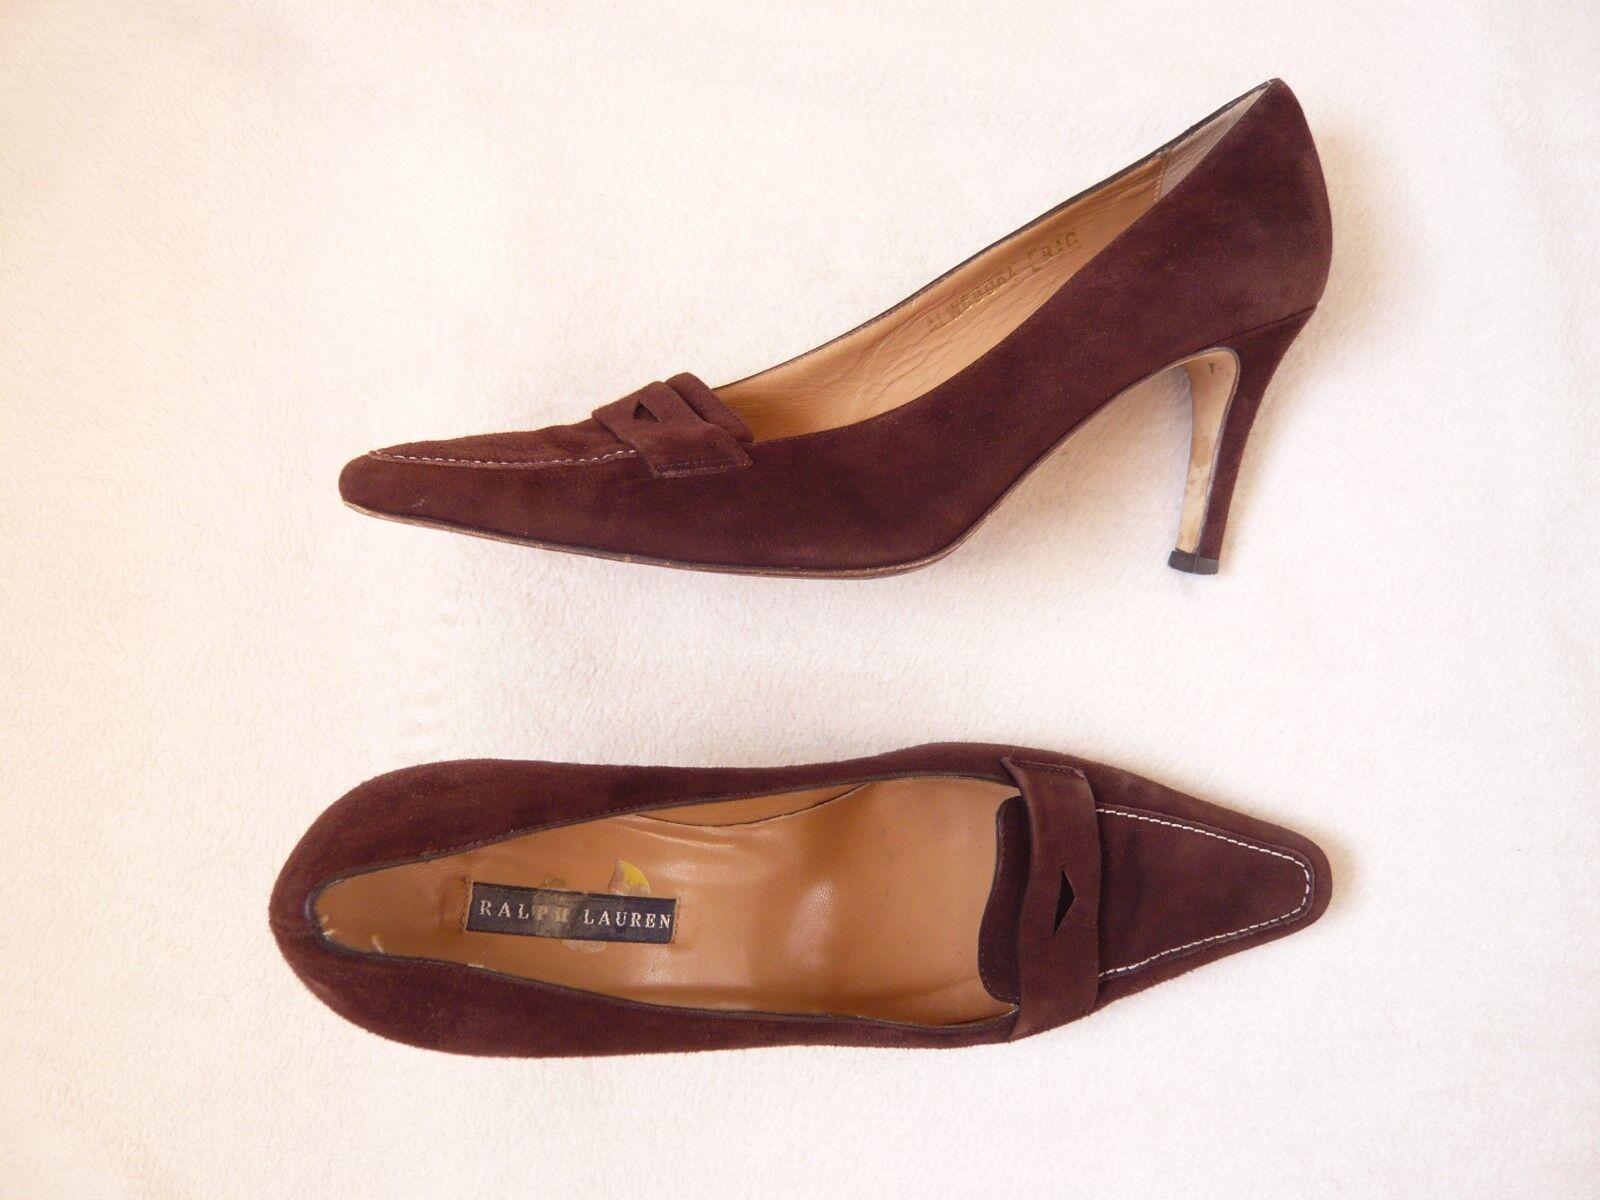 Ralph Lauren Gamuza Zapatos Tribunal De Gamuza Lauren Marrón o bombas Forro De Cuero + 7.5 Soles en muy buena condición 5e47ec